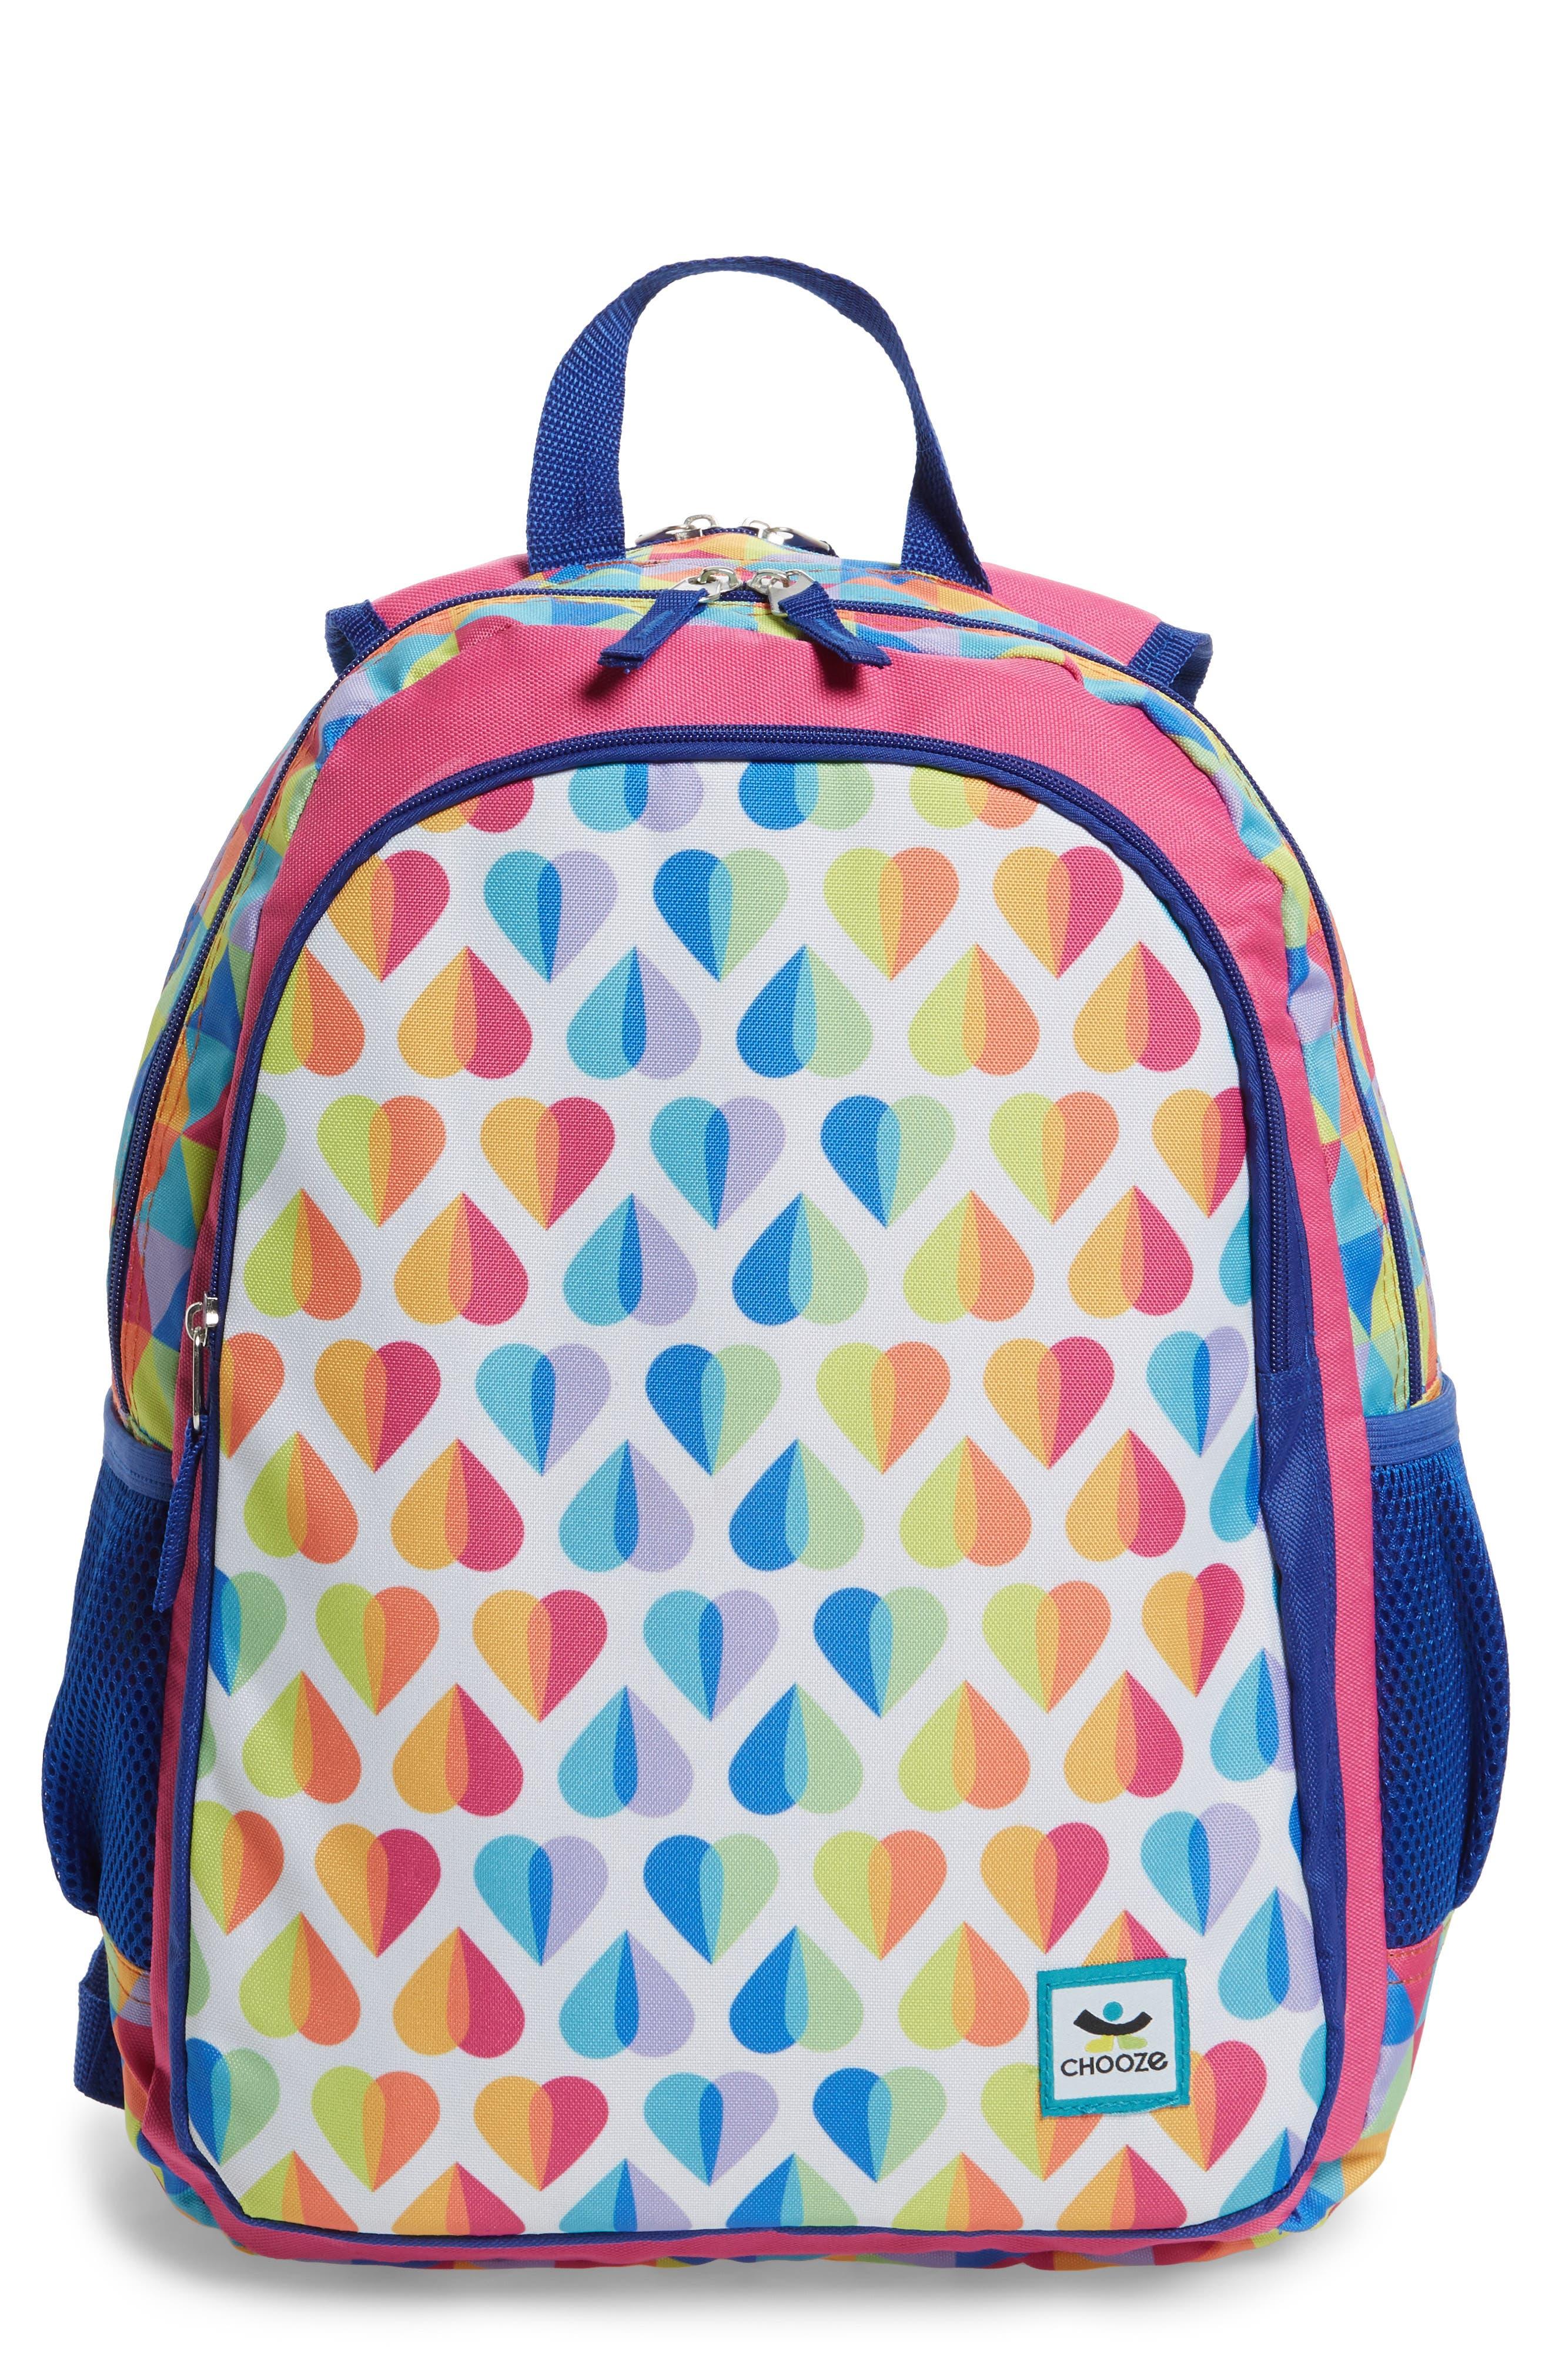 CHOOZE Reversible Backpack